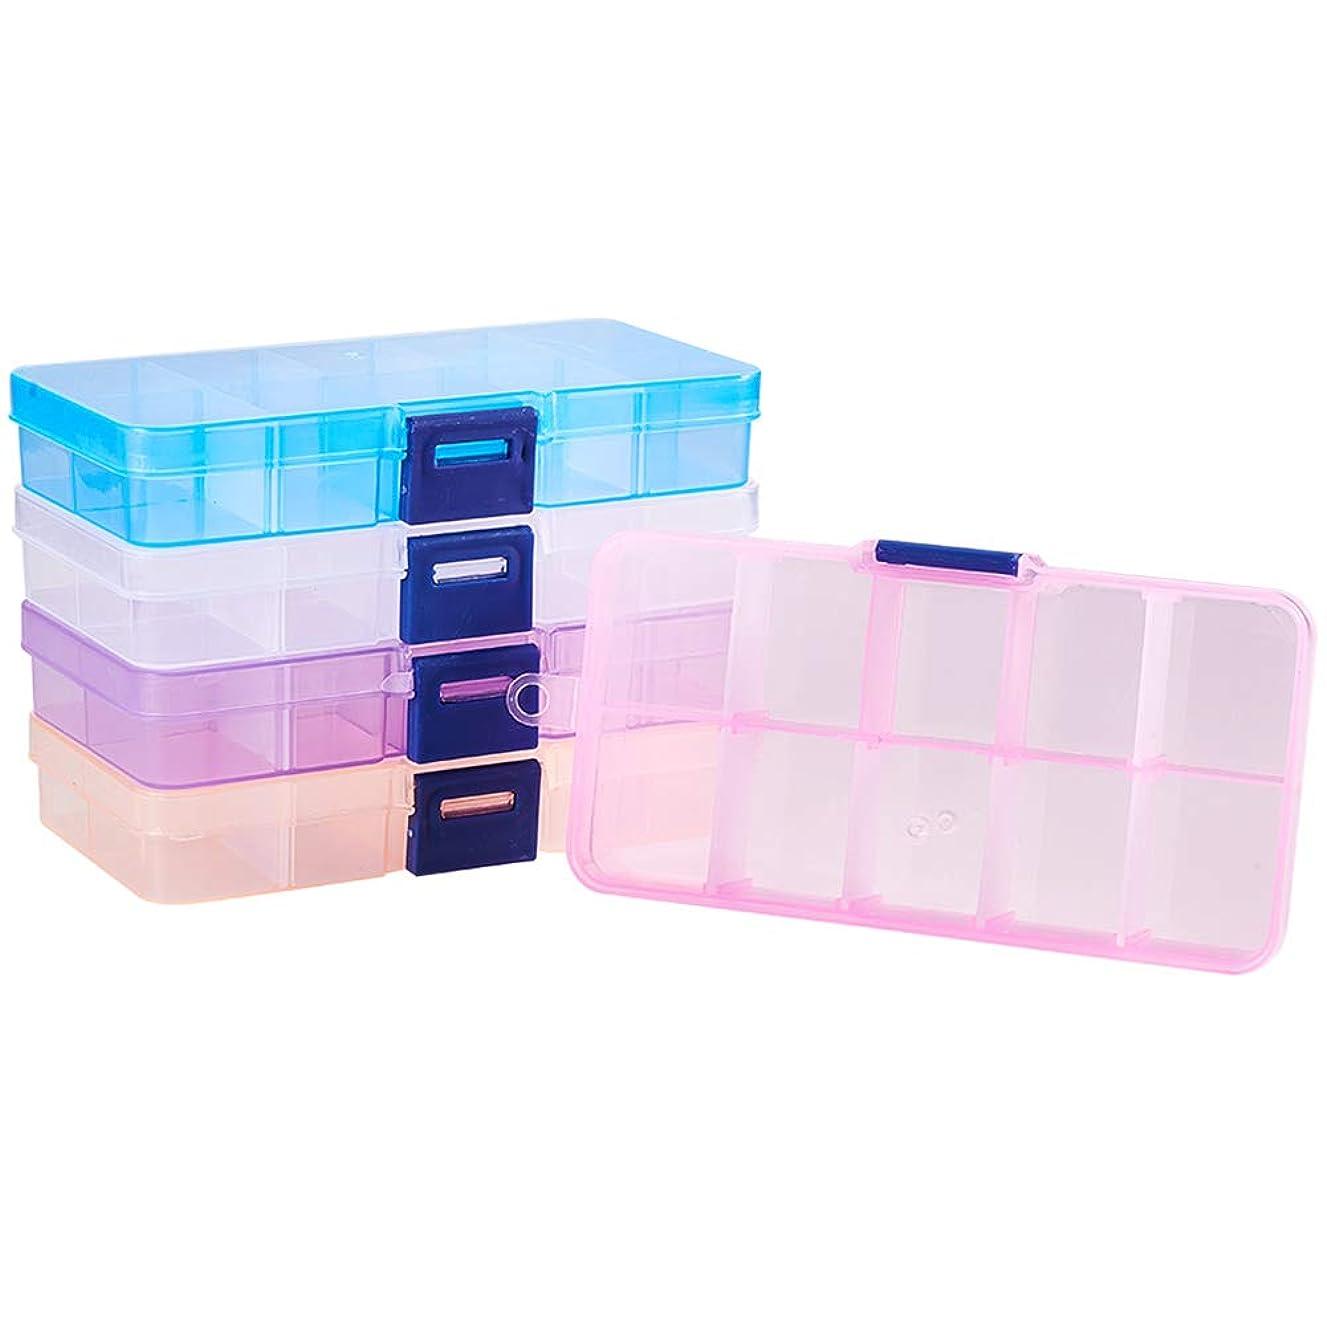 PH PandaHall 5 Pack 10 Grids Rectangle Plastic Bead Storage Box Case Container Jewelry Organizer, 68 x 129 x 22mm